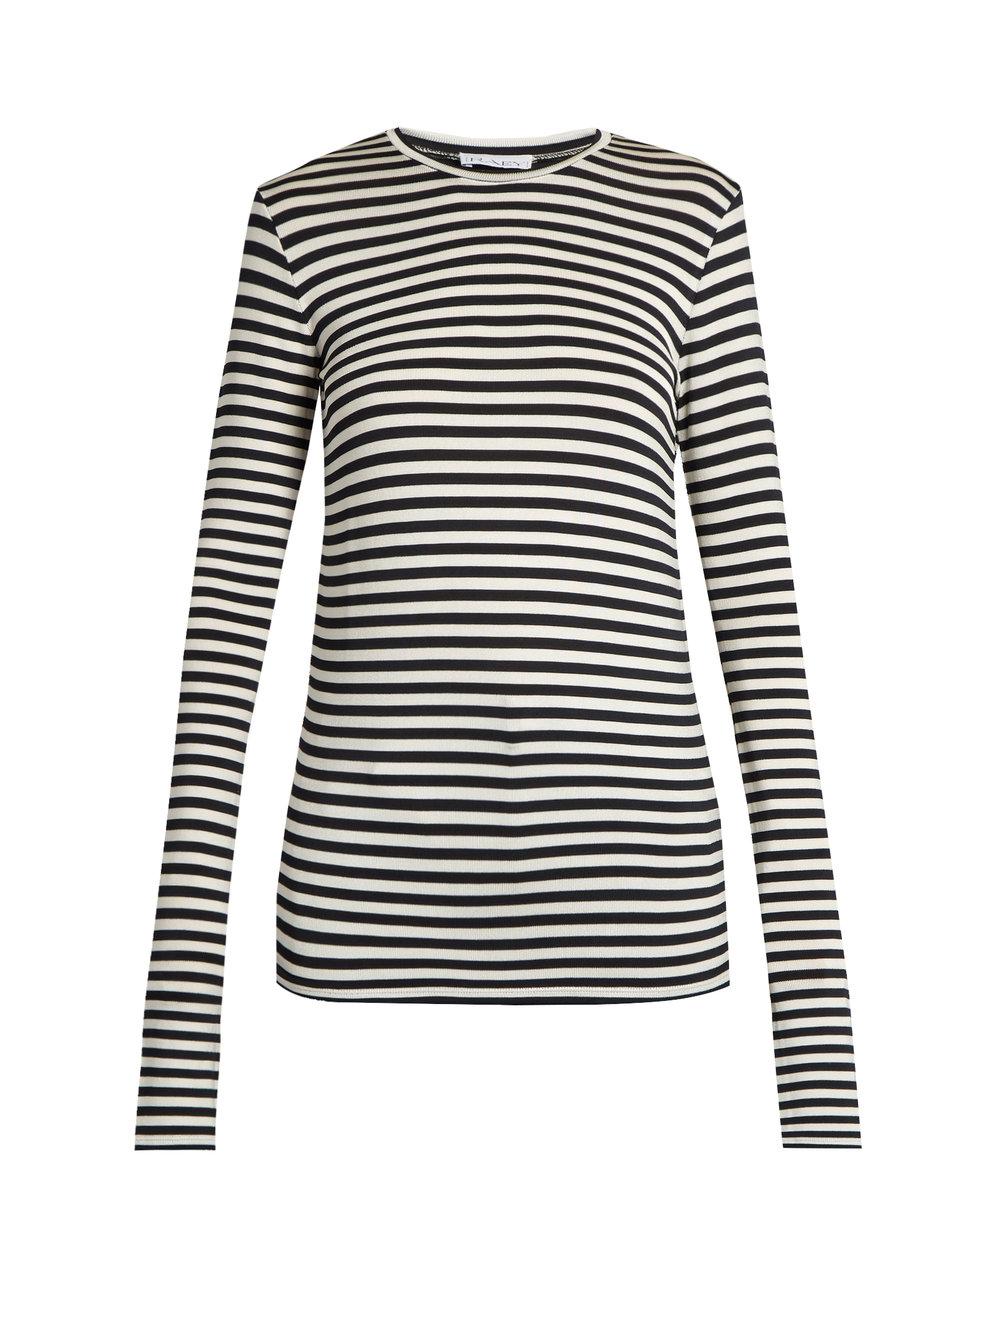 raey stripes.jpg